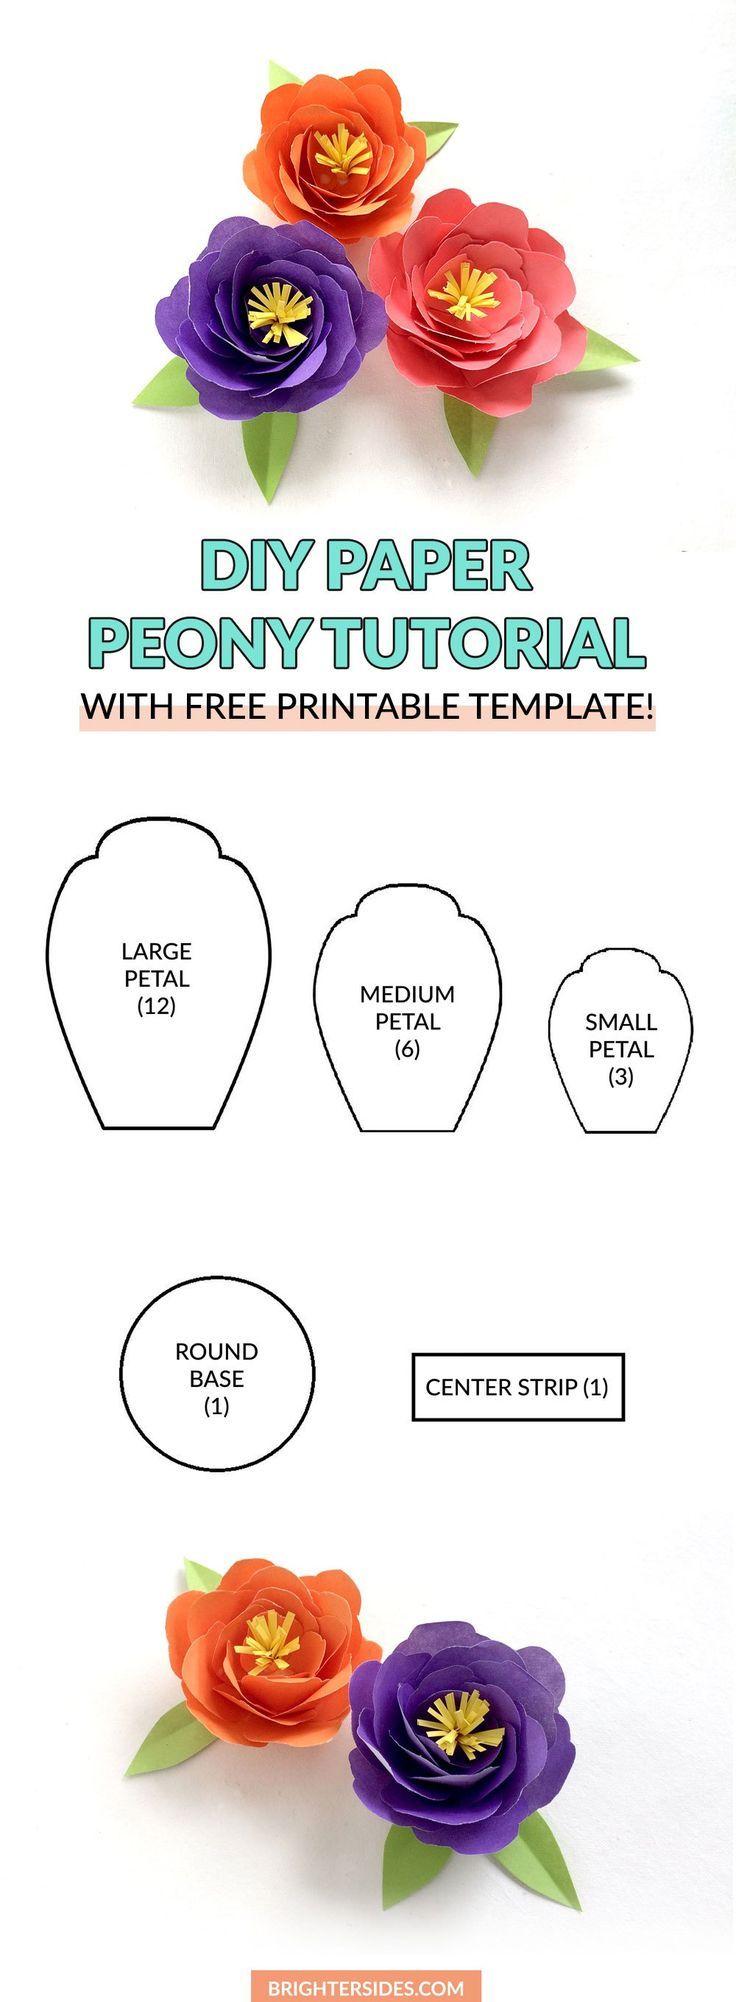 DIY paper peonies with free printable template. [how to make paper flowers, DIY paper flower template, easy paper flower tutorial, paper craft]